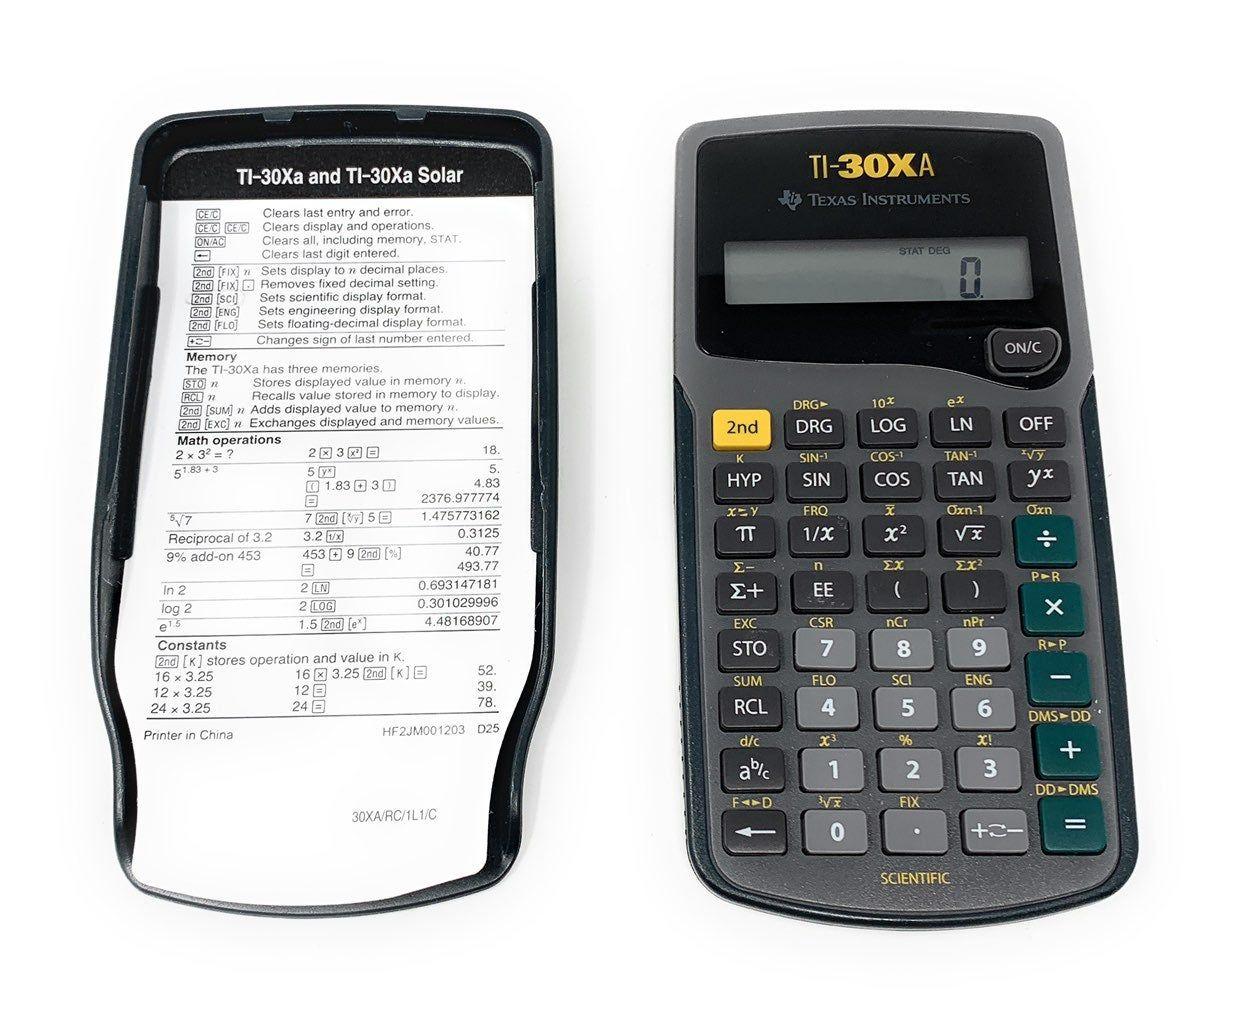 Texas Instruments Ti 30xa Scientific Calculator With Case Manual Quick Use Guide Scientific Calculator Graphing Calculator Calculator